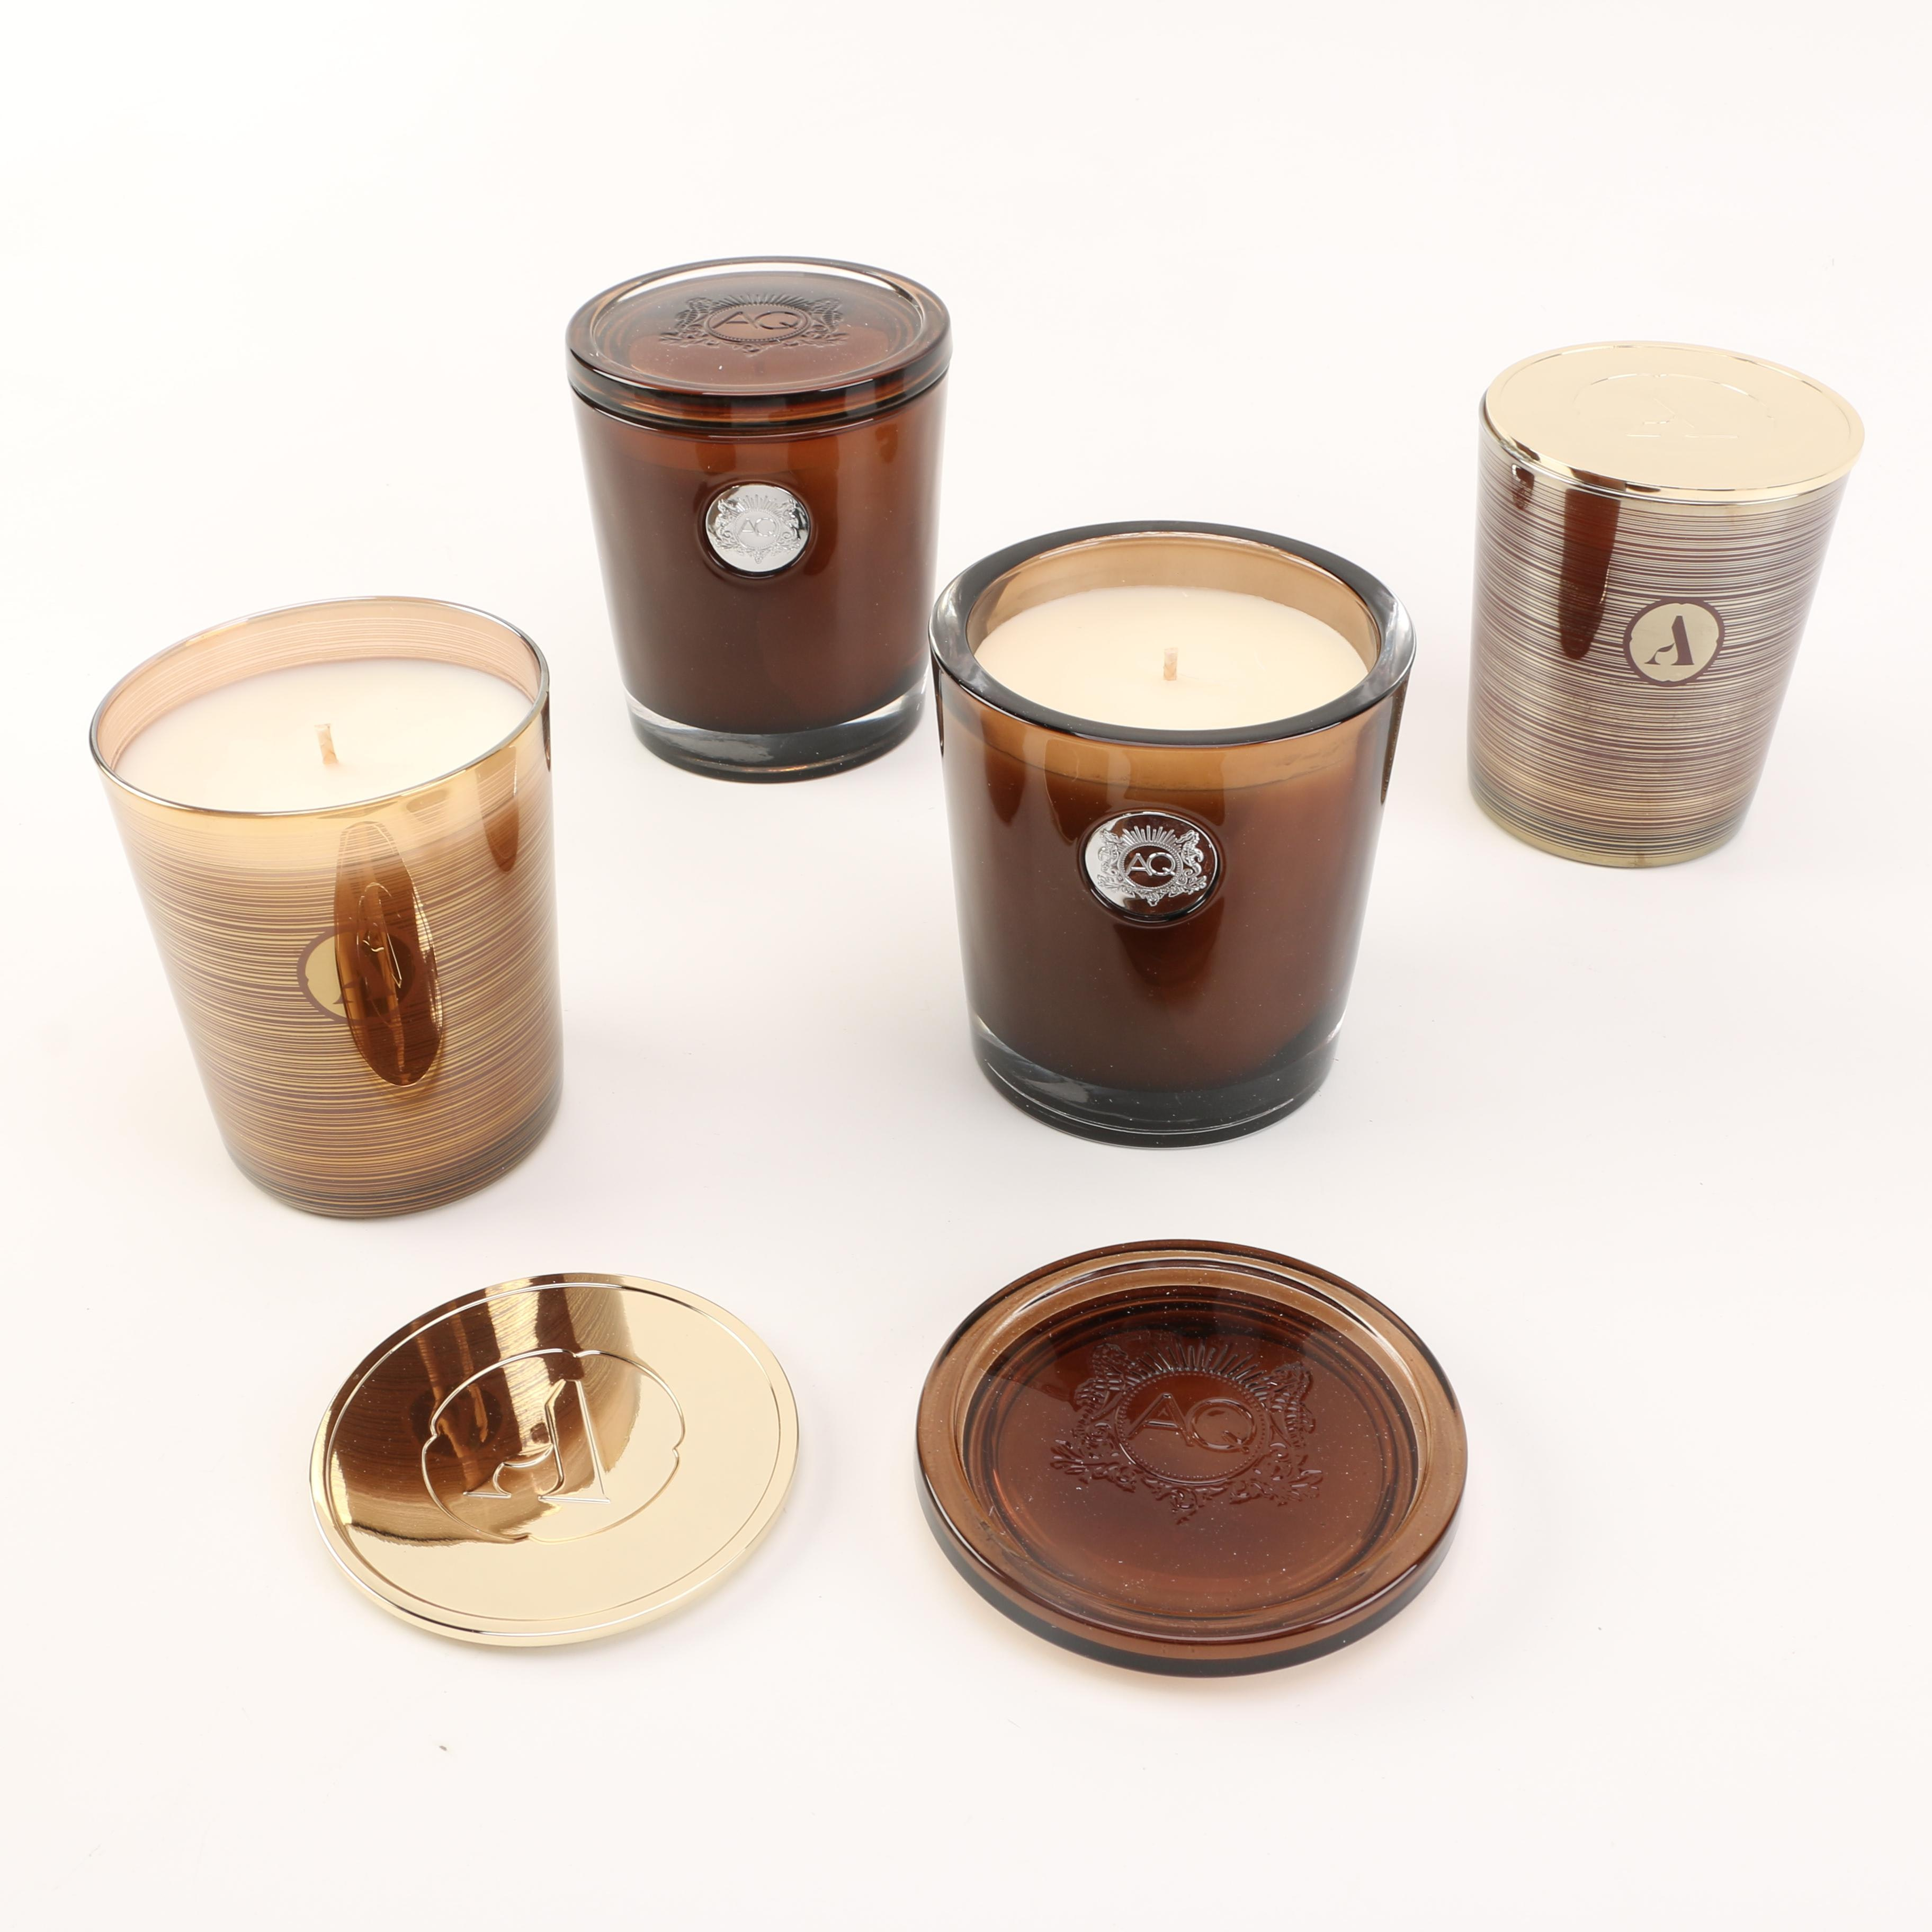 Aquiesse Lidded Scented Candle Set